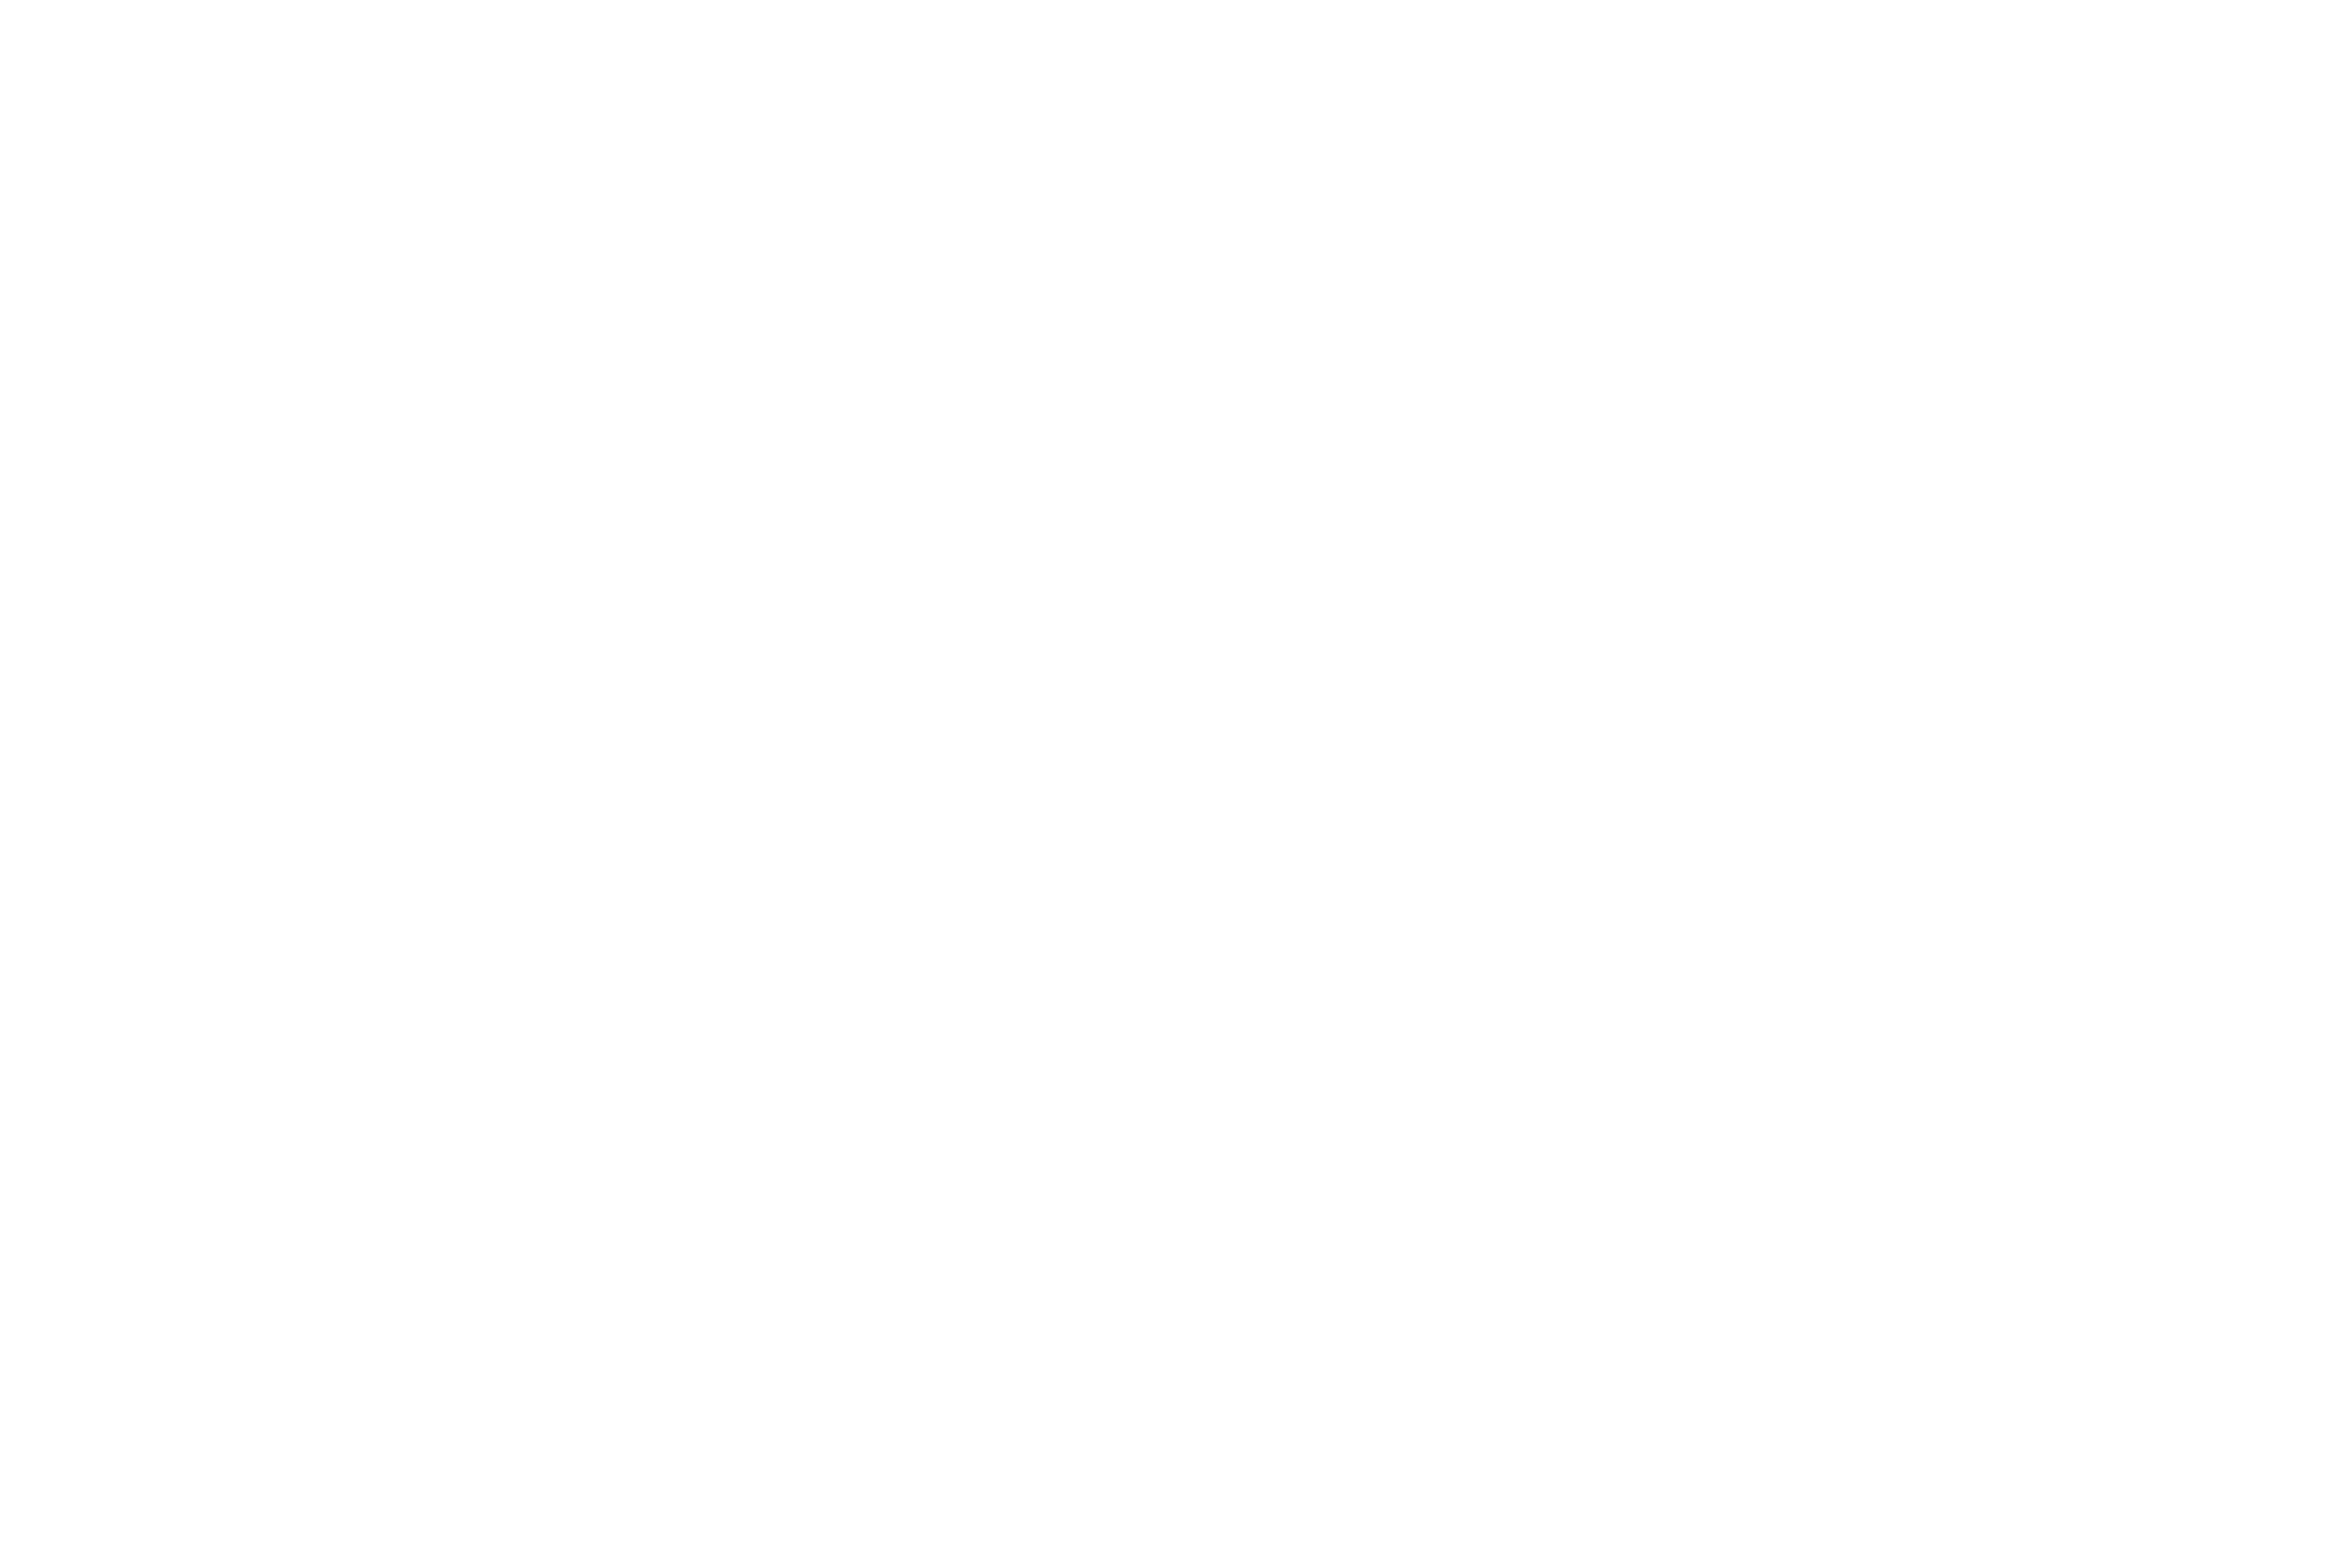 Firm400 at Nissfest SoCal 2021